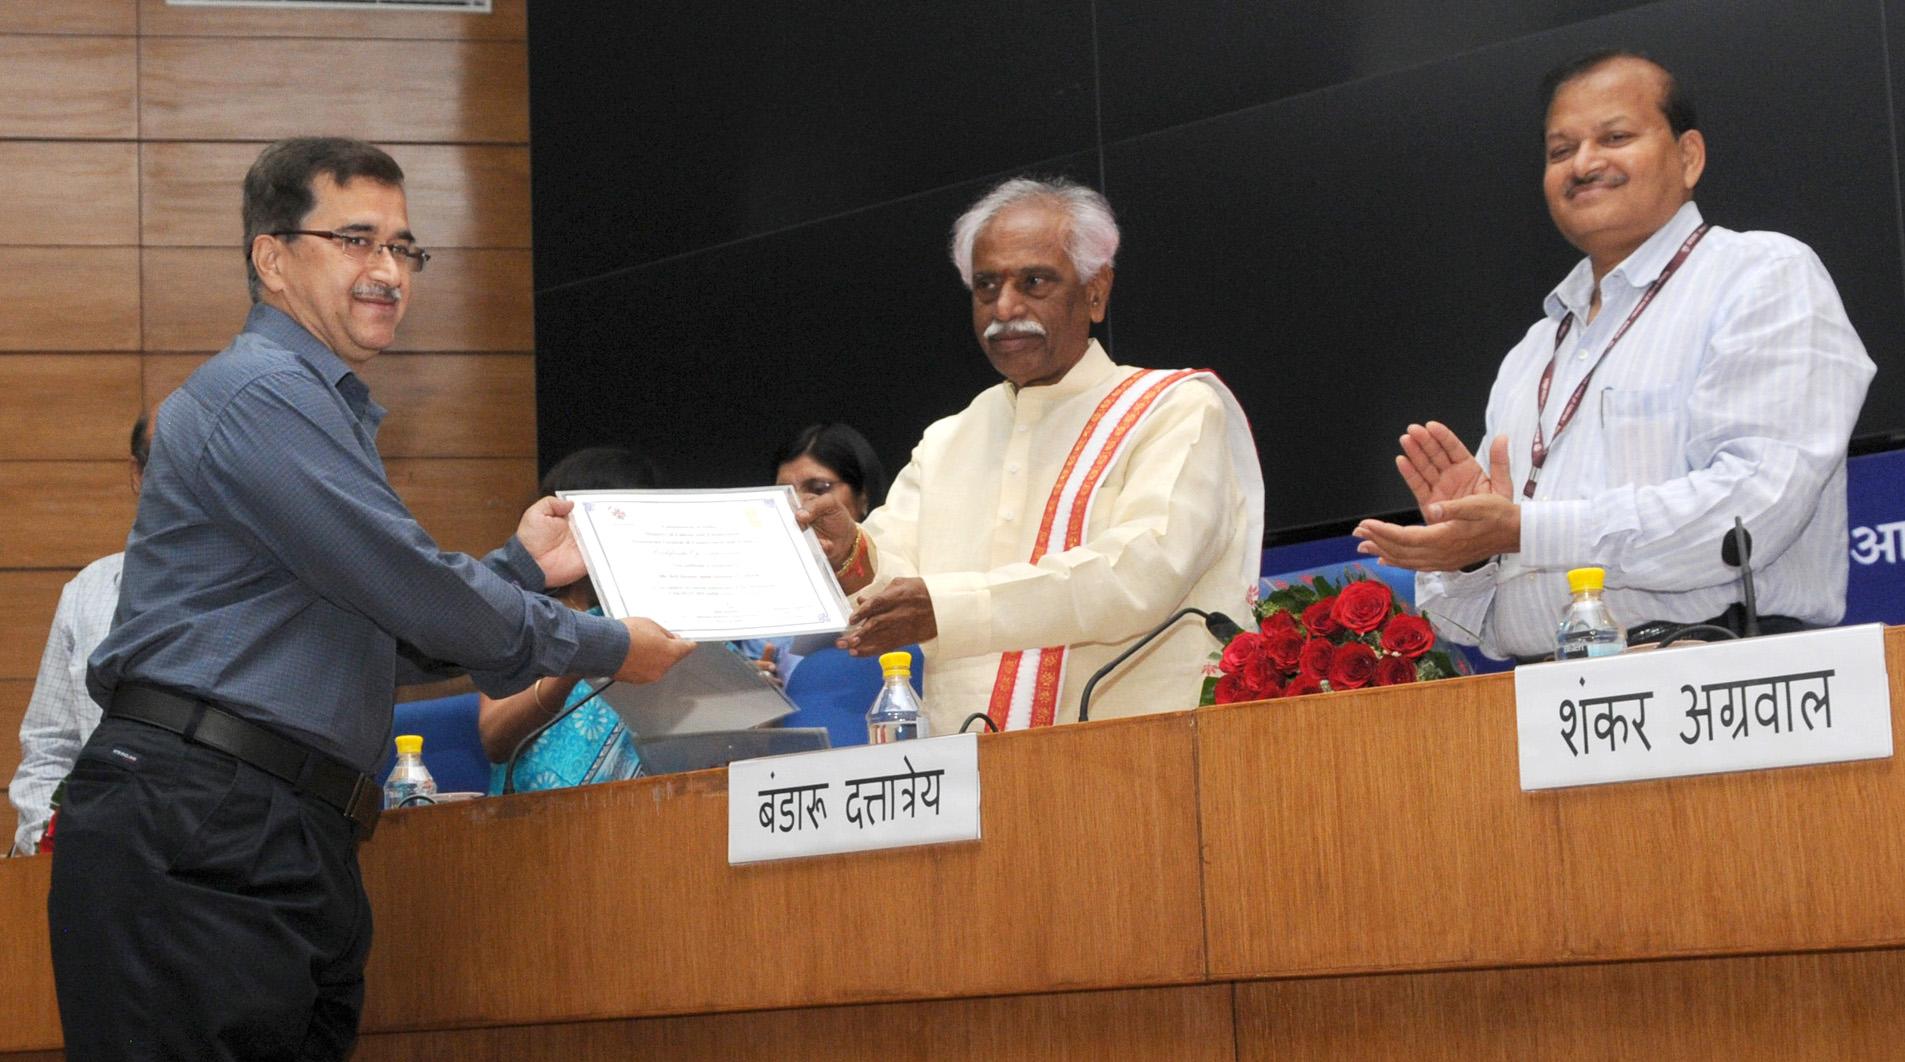 File:Bandaru Dattatreya awarding e-certificates from the